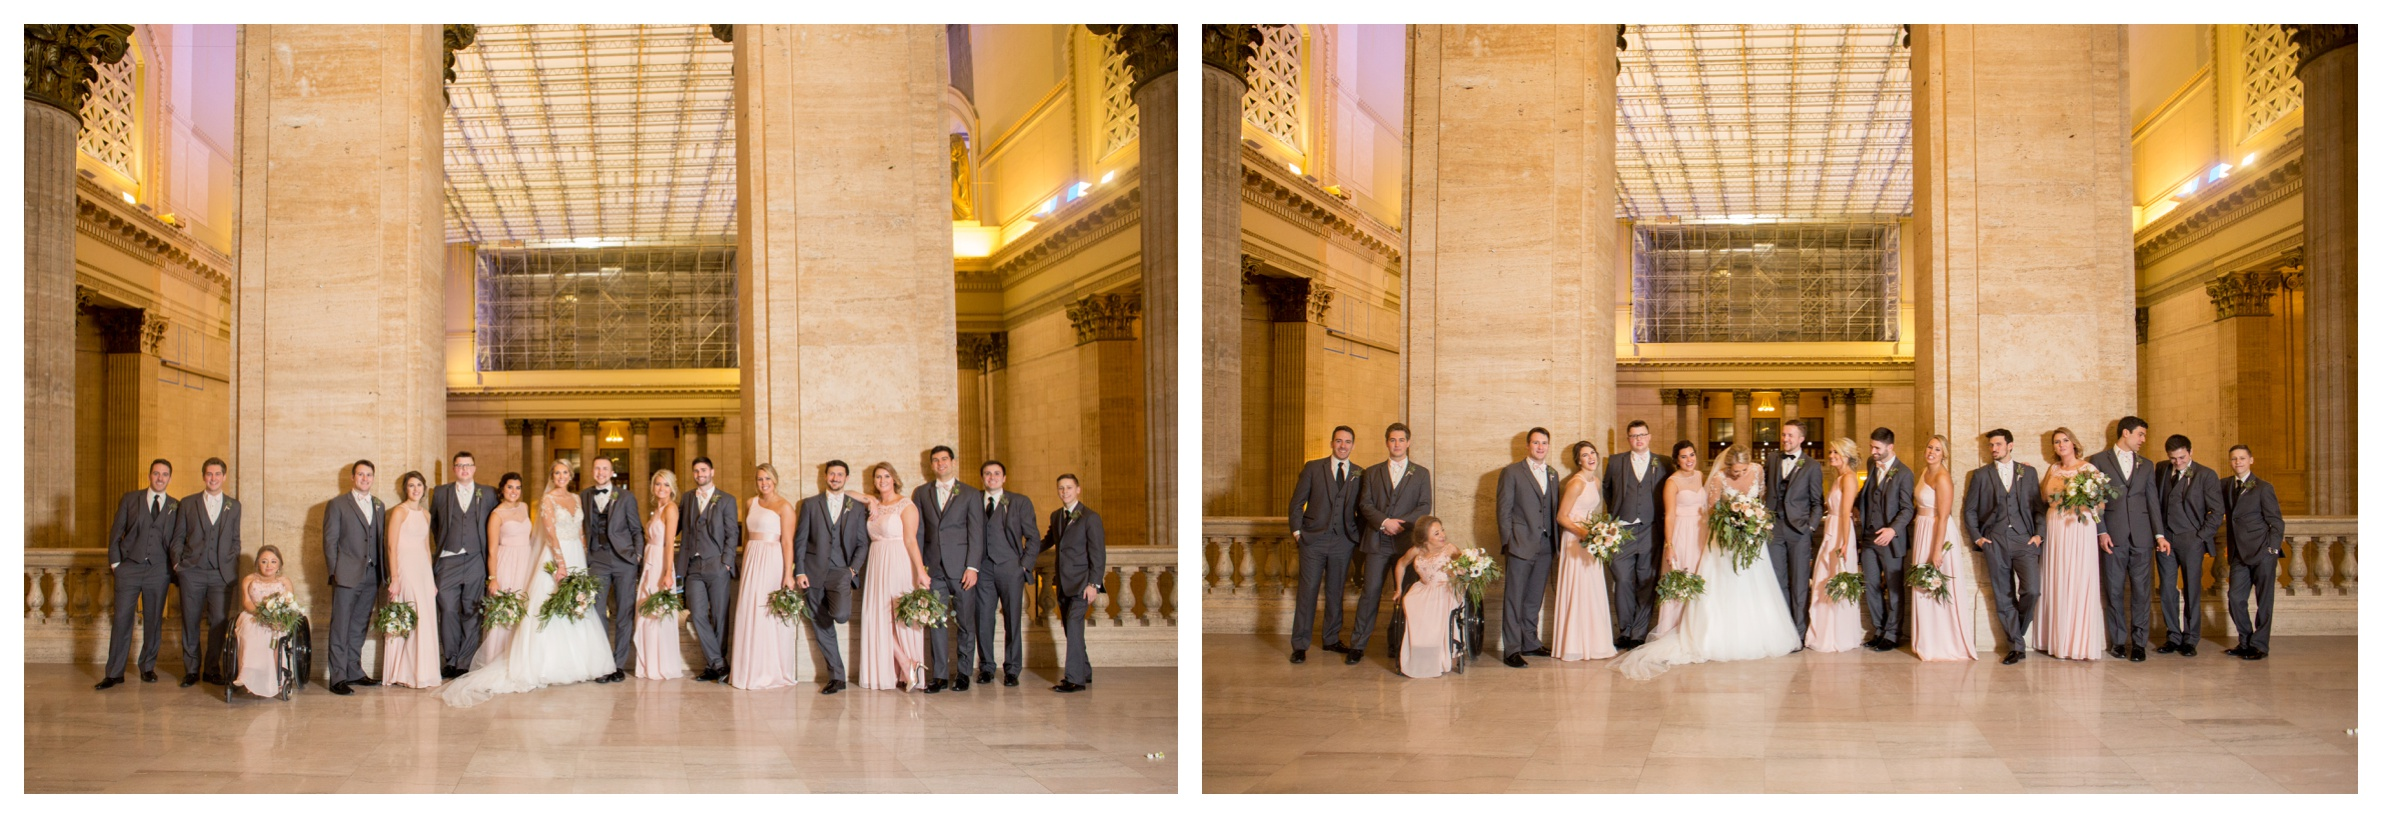 chicago-wedding-photography-union-station